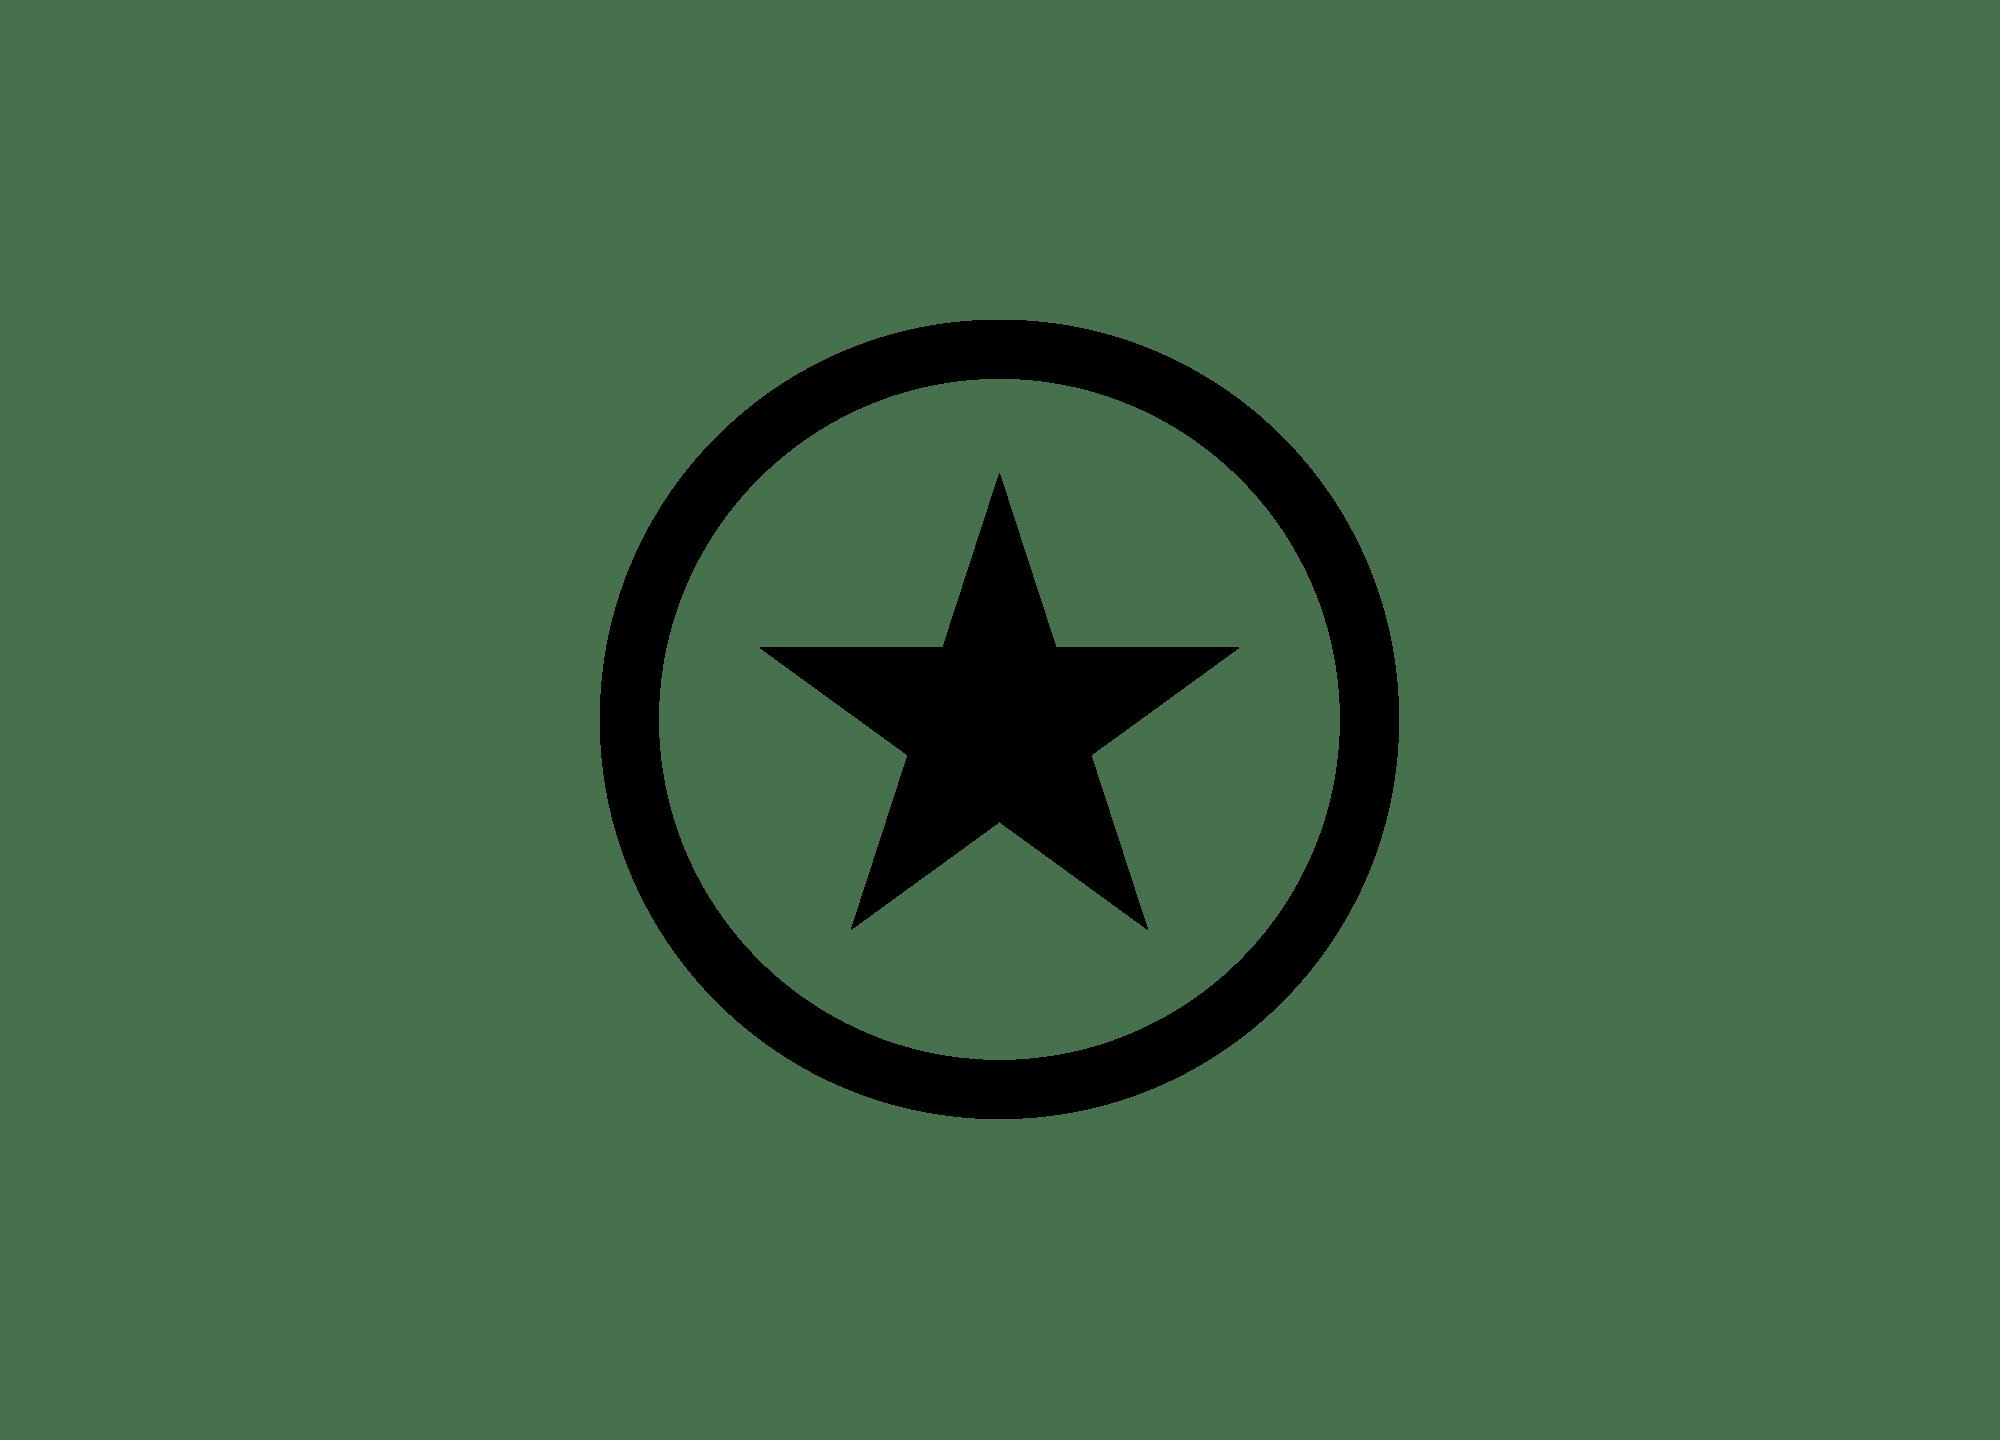 Black star Logos